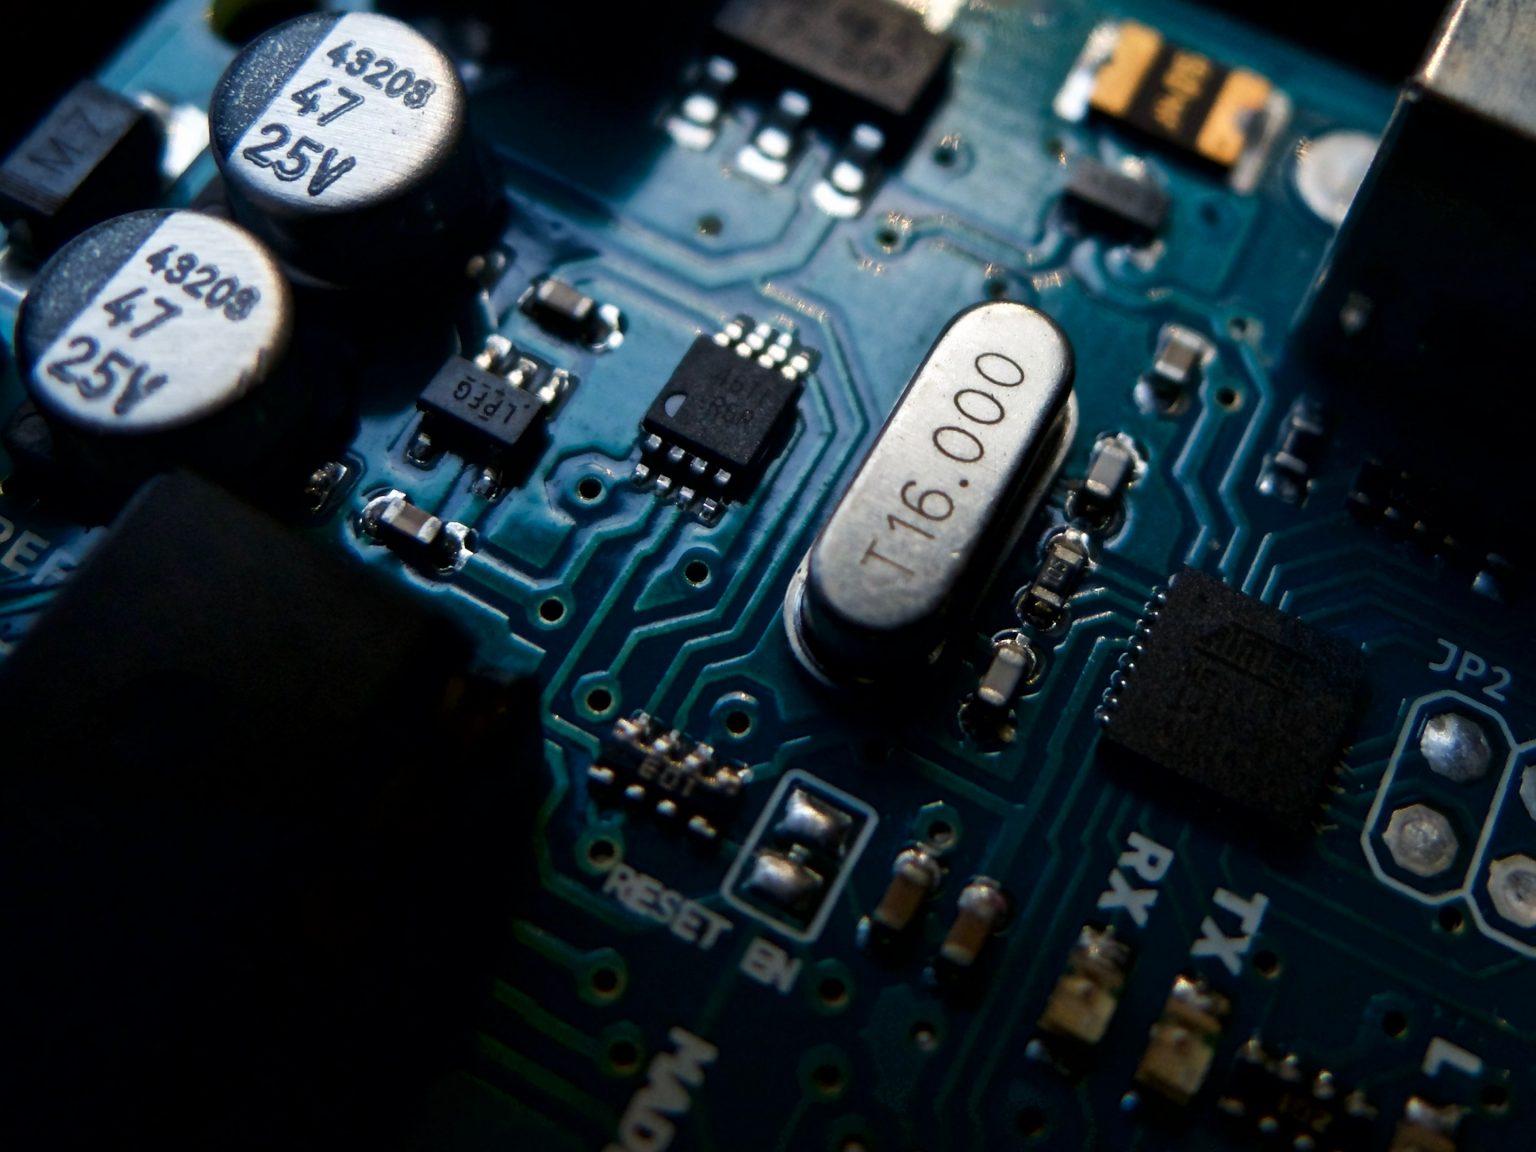 NB-IoT and LTE-M development kits